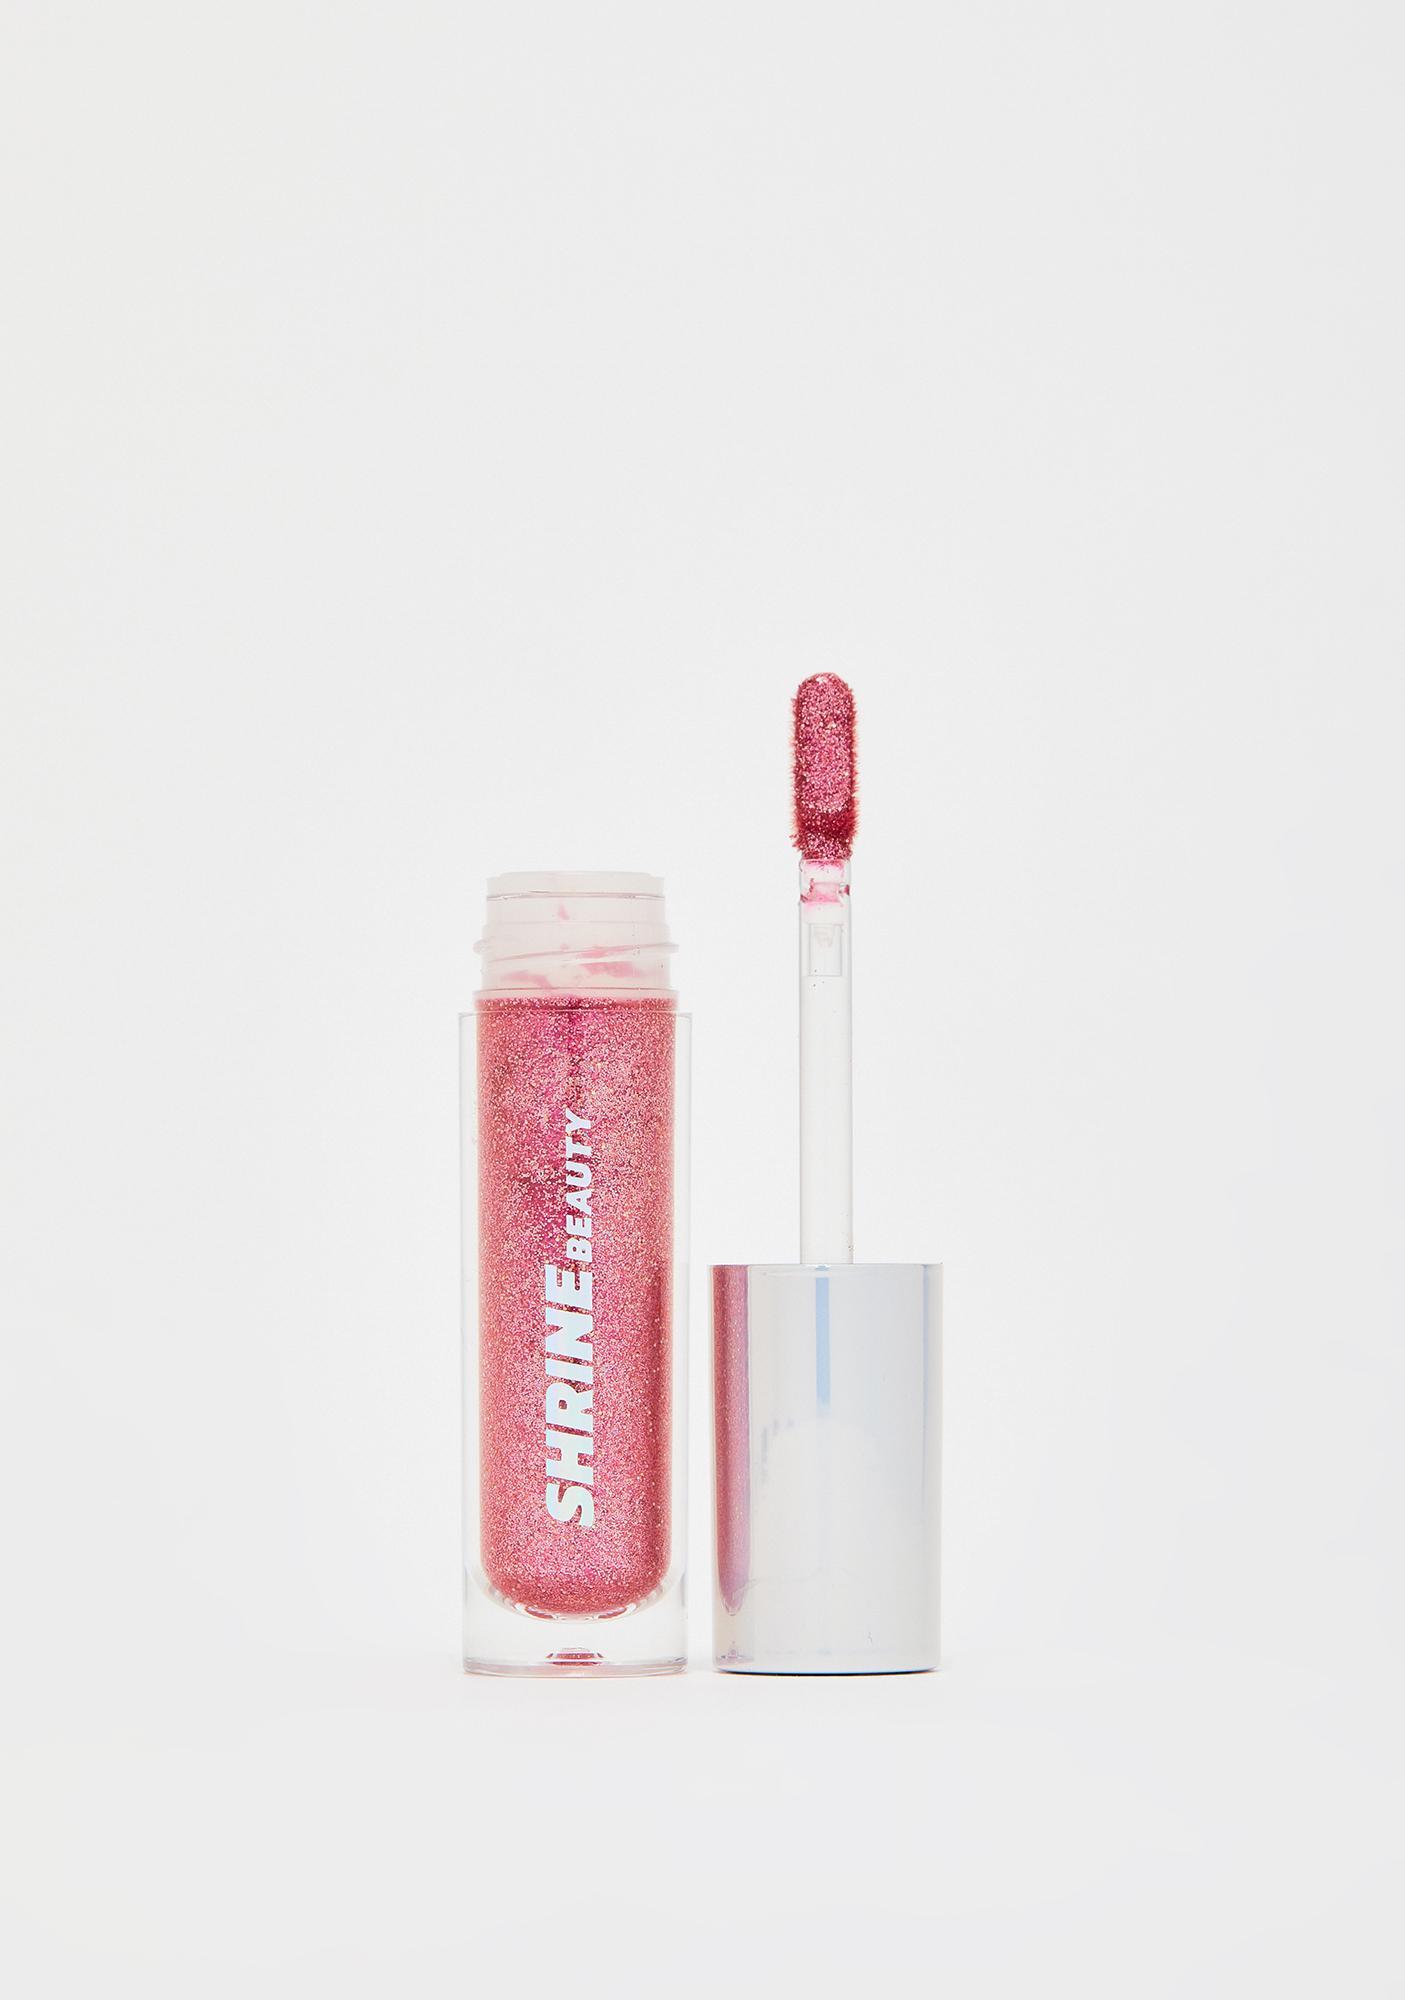 Shrine Hot Pink Glitter Lids Liquid Eyeshadow